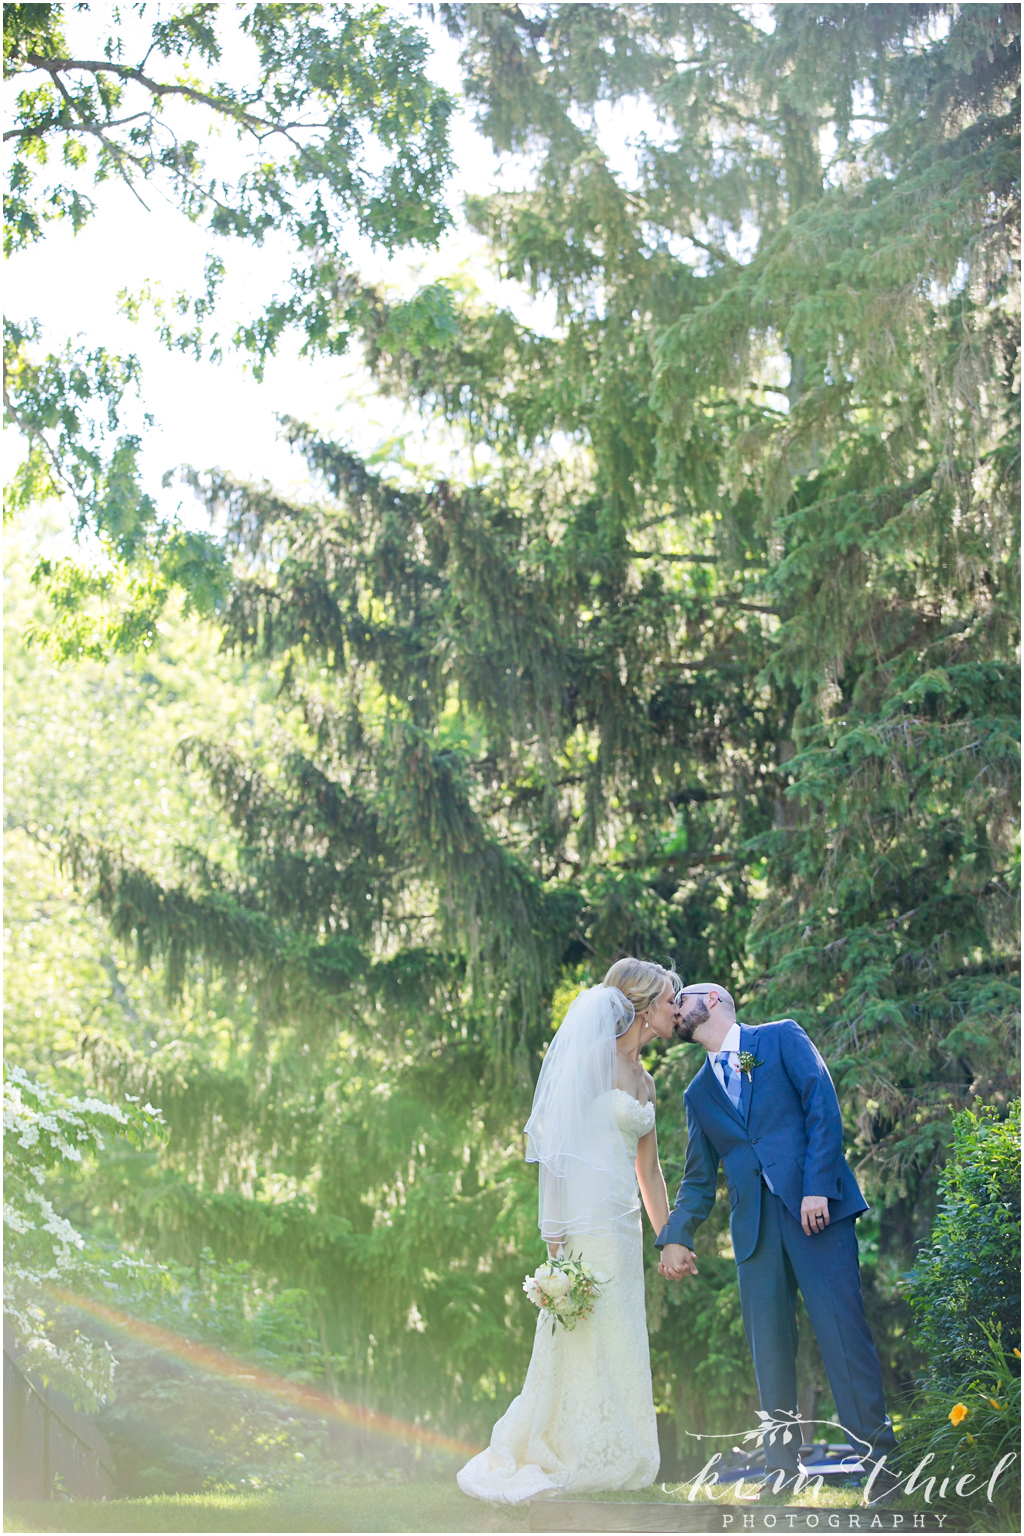 Kim-Thiel-Photography-Indiana-Wedding-Photographer-33, Romantic Backyard Indiana Wedding